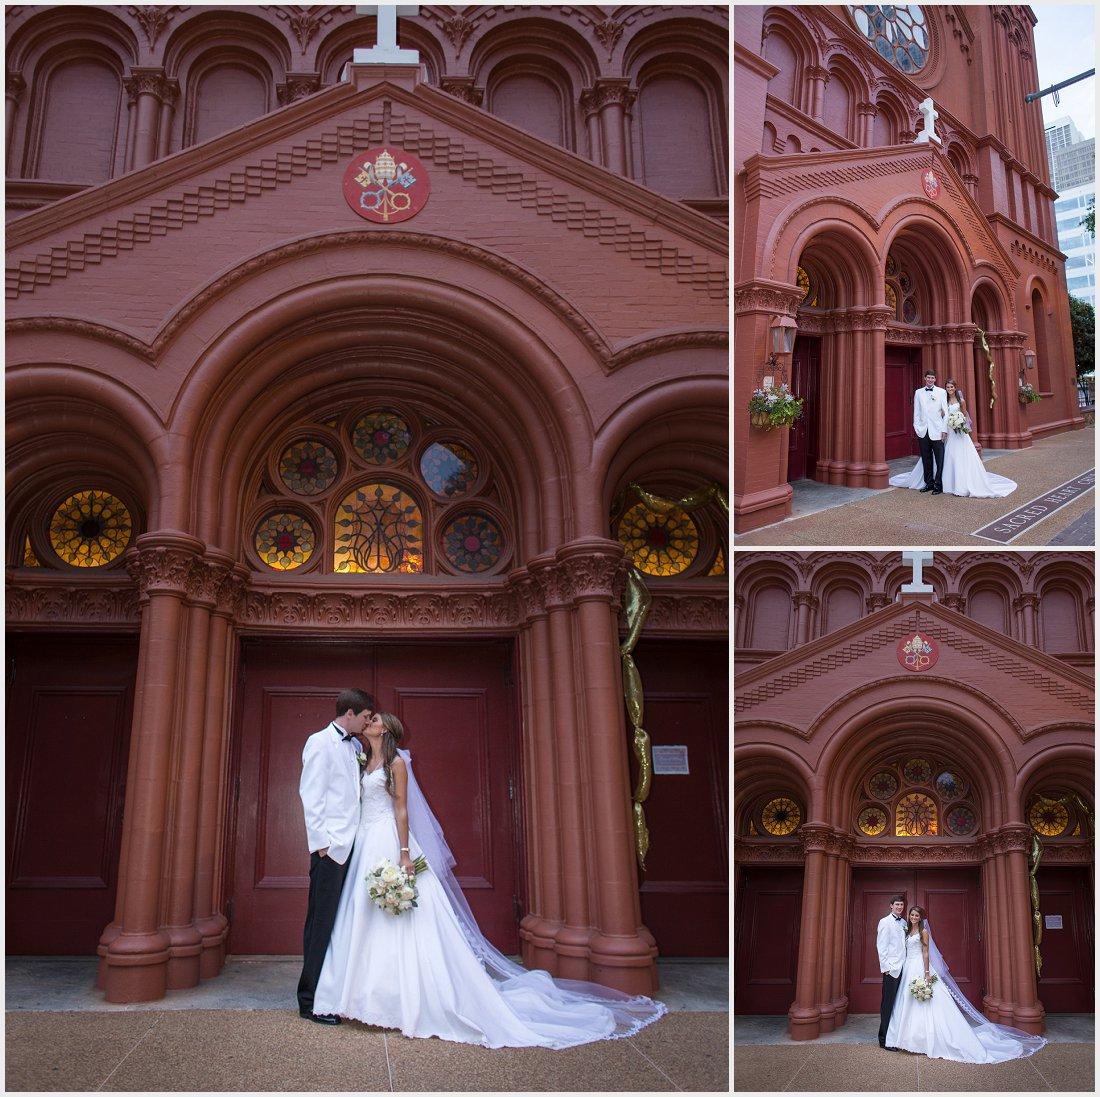 sacred-heart-basilica-wedding-3